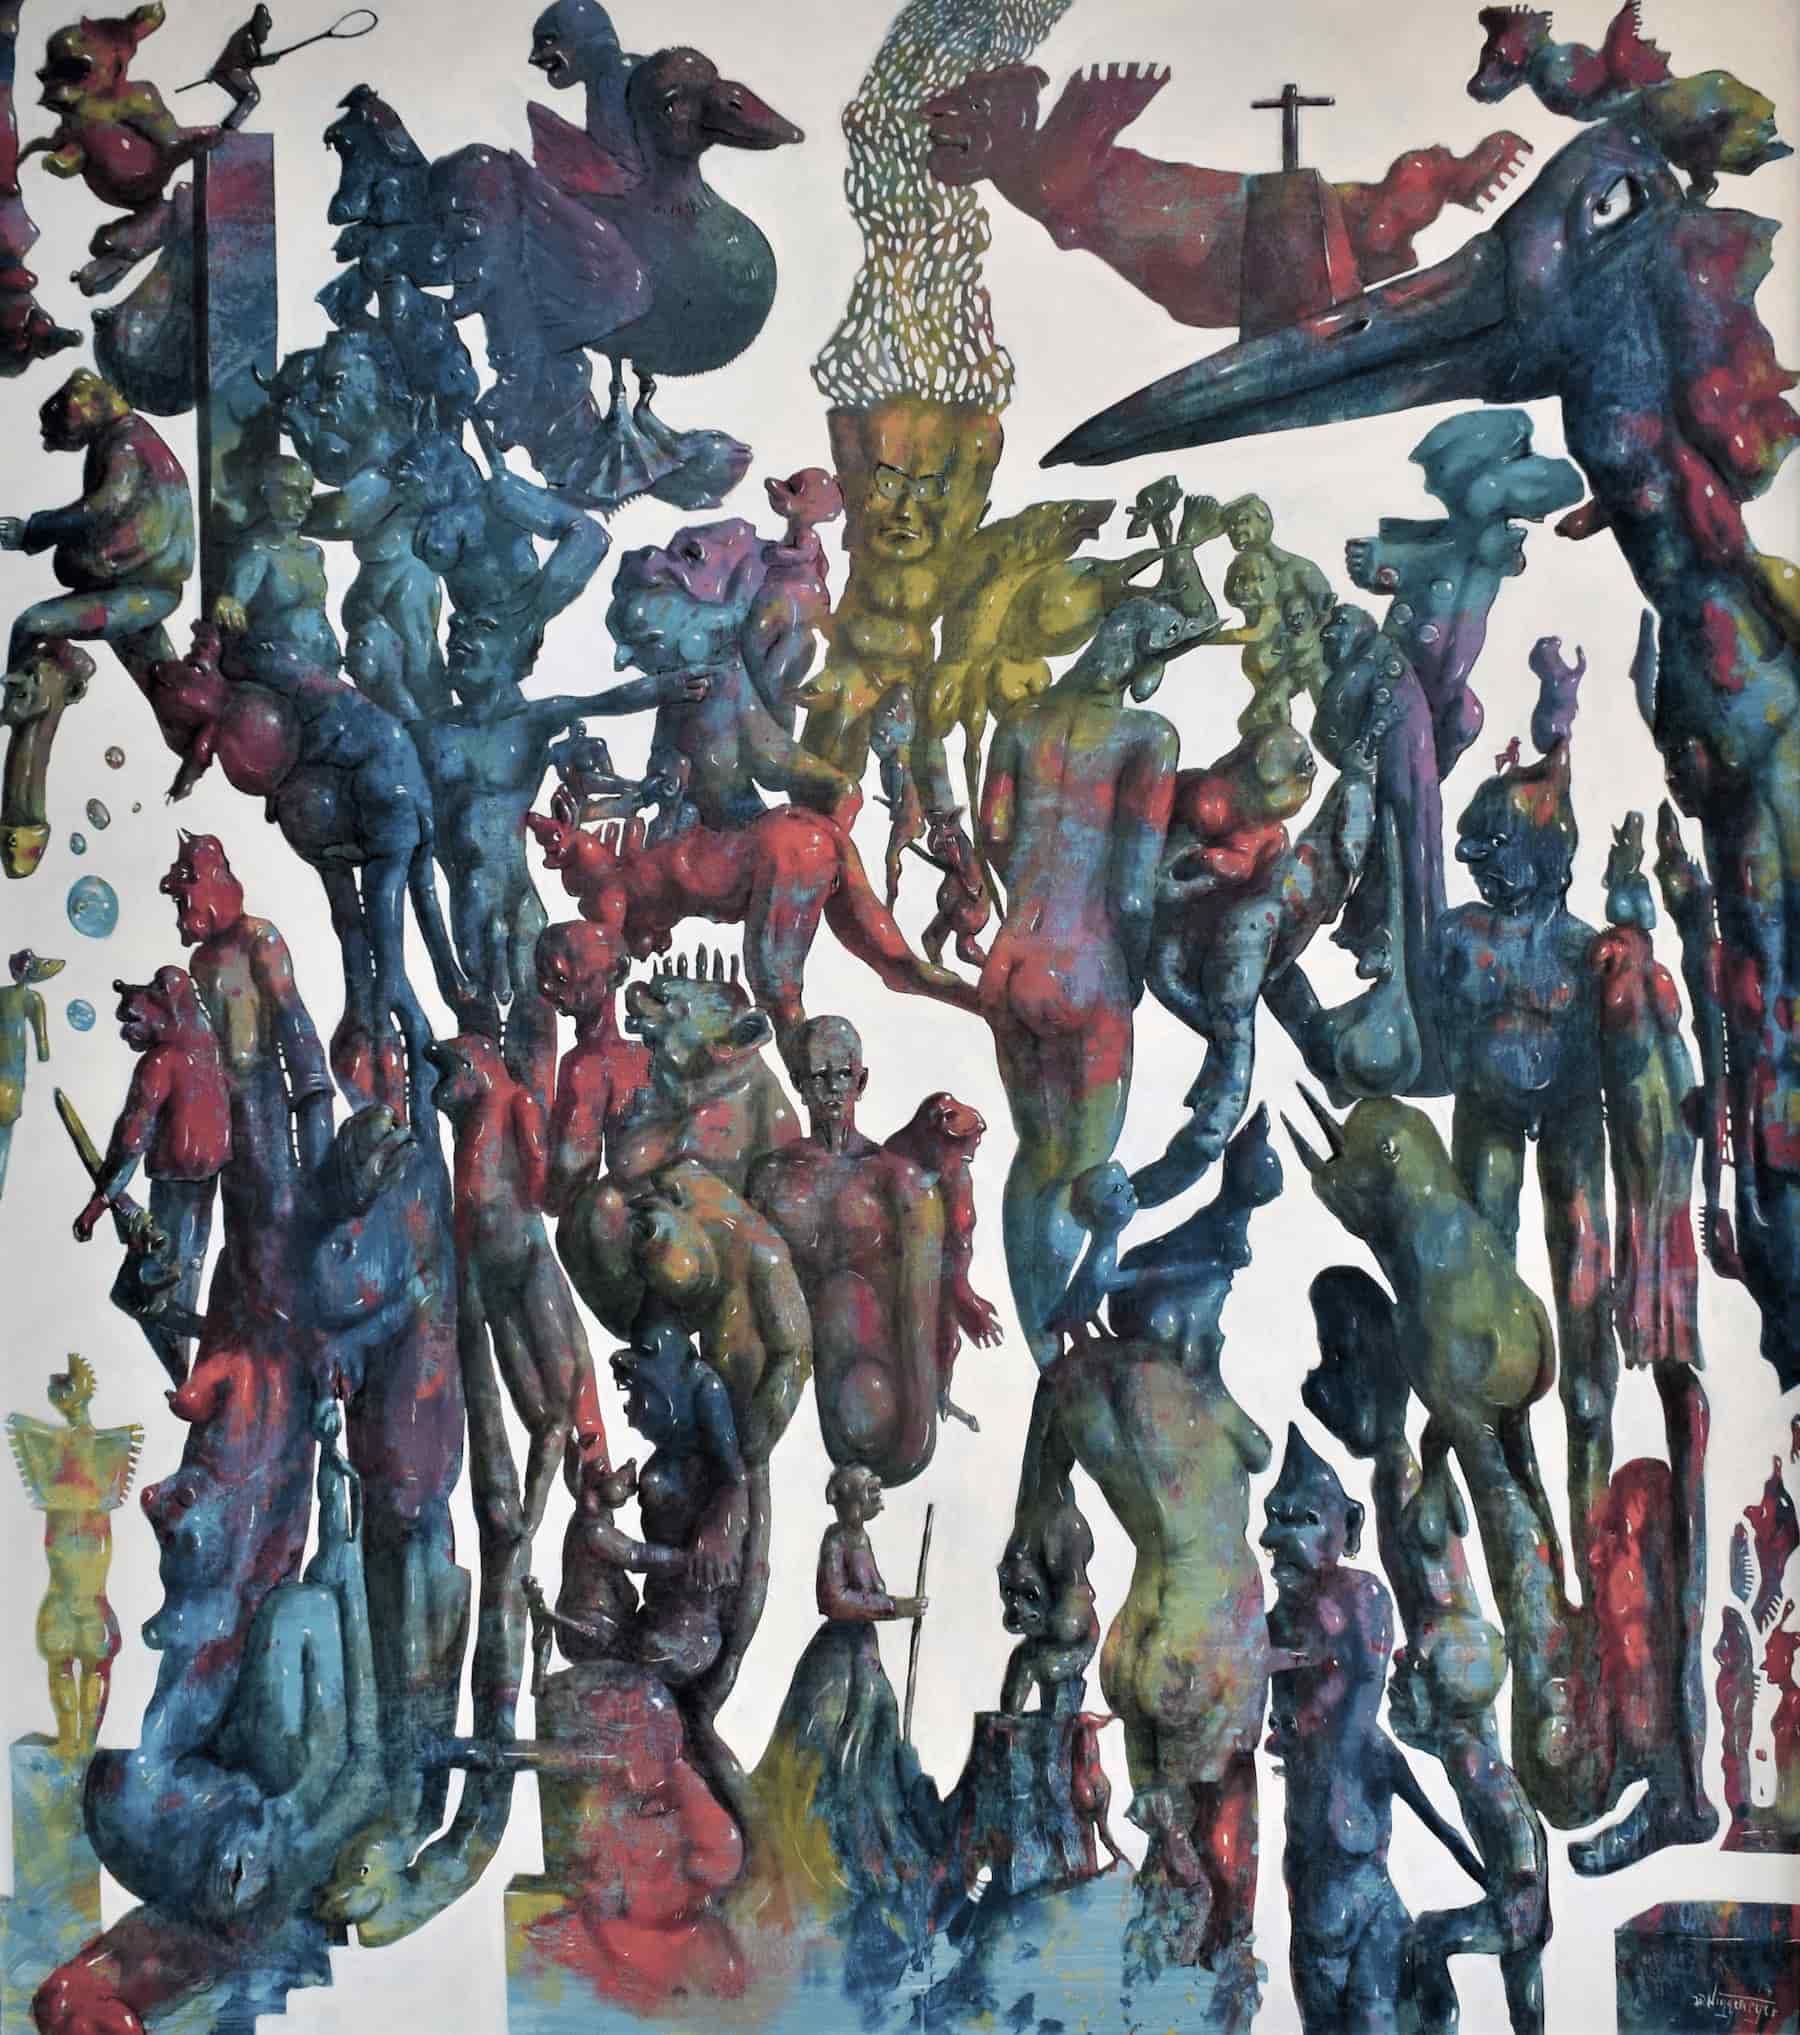 Die Moral, 150 x 150 cm, Acryl, Öl auf Leinwand